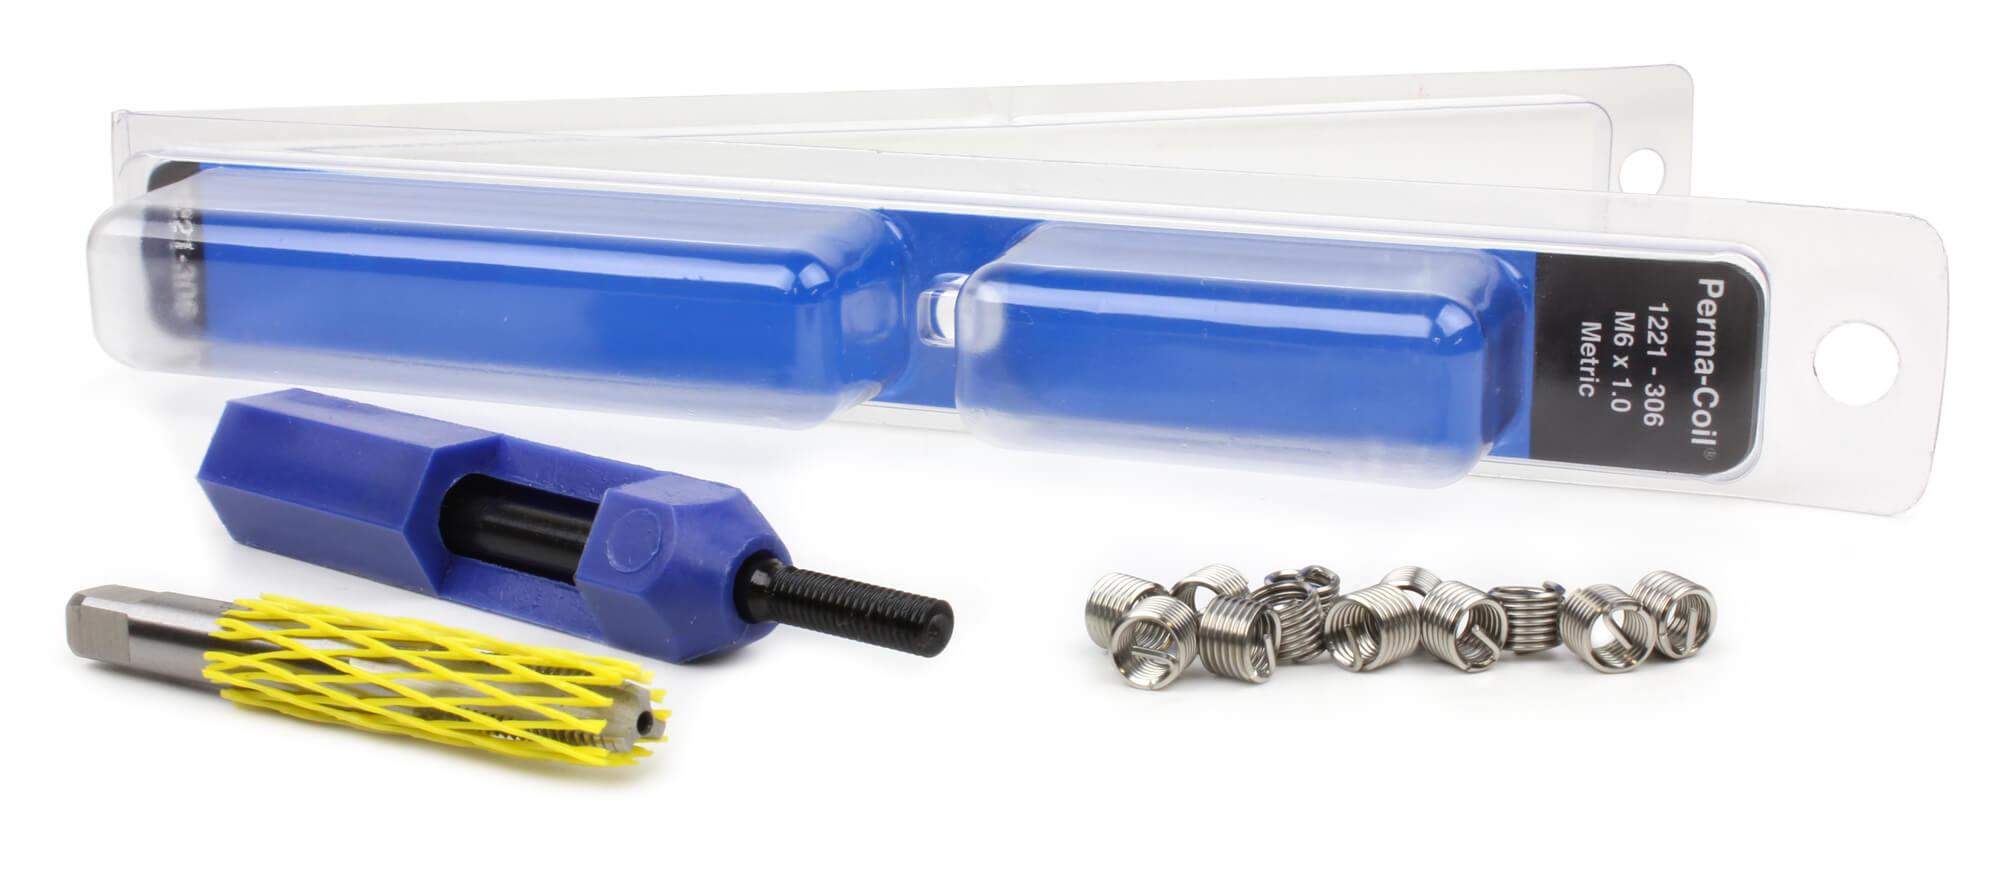 Thread Kits 1221-309 Thread Repair Kit